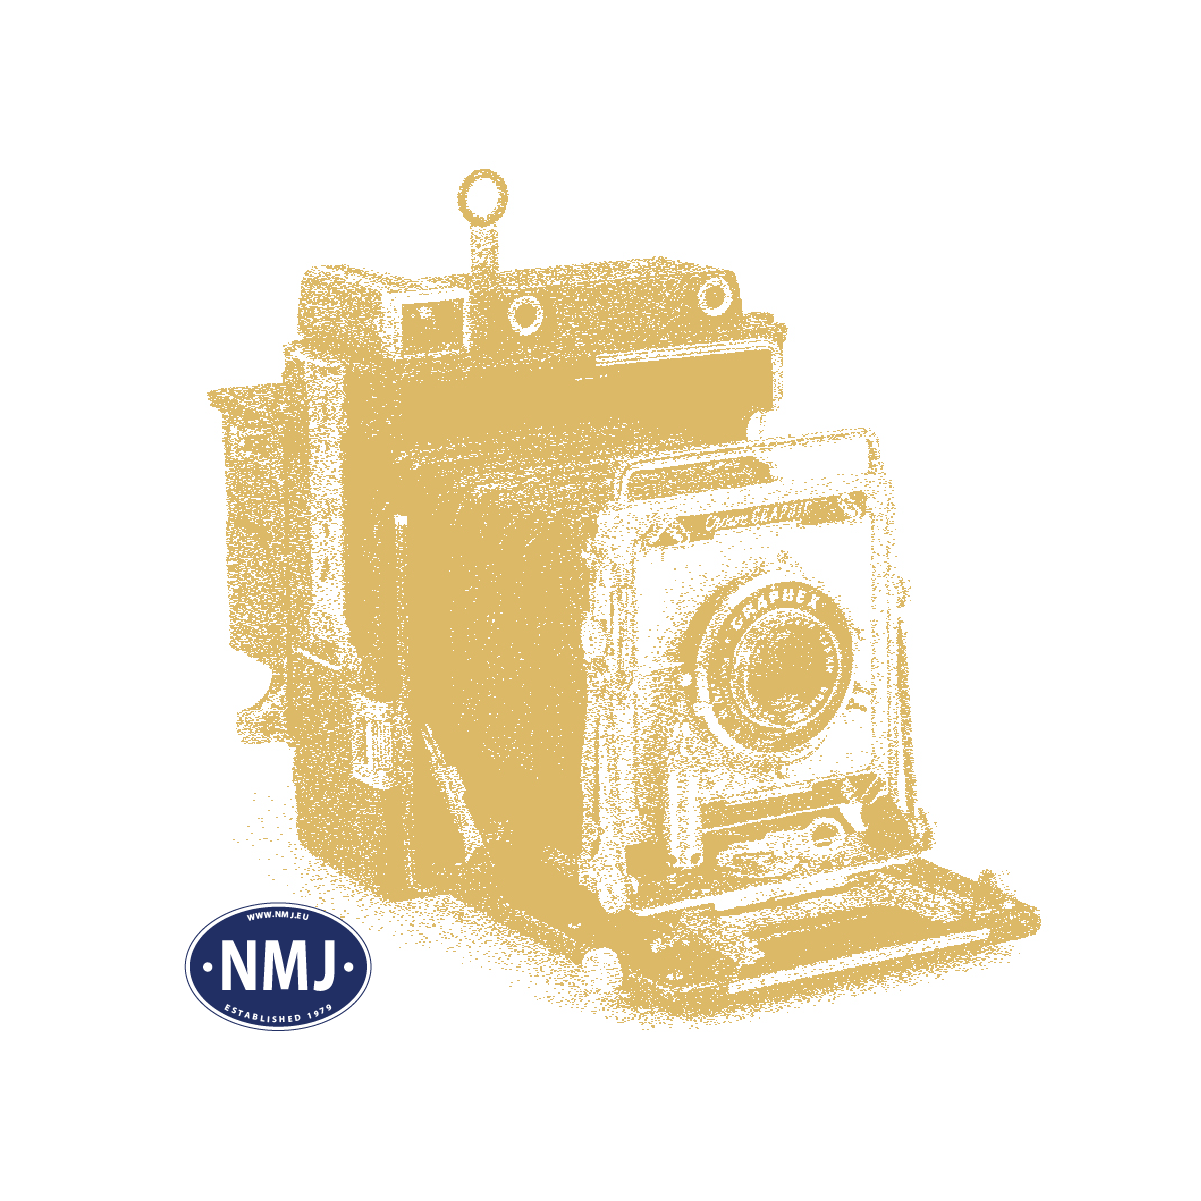 TOM02070401 - Micro Lysdiode m/print og loddepunkter, Rød